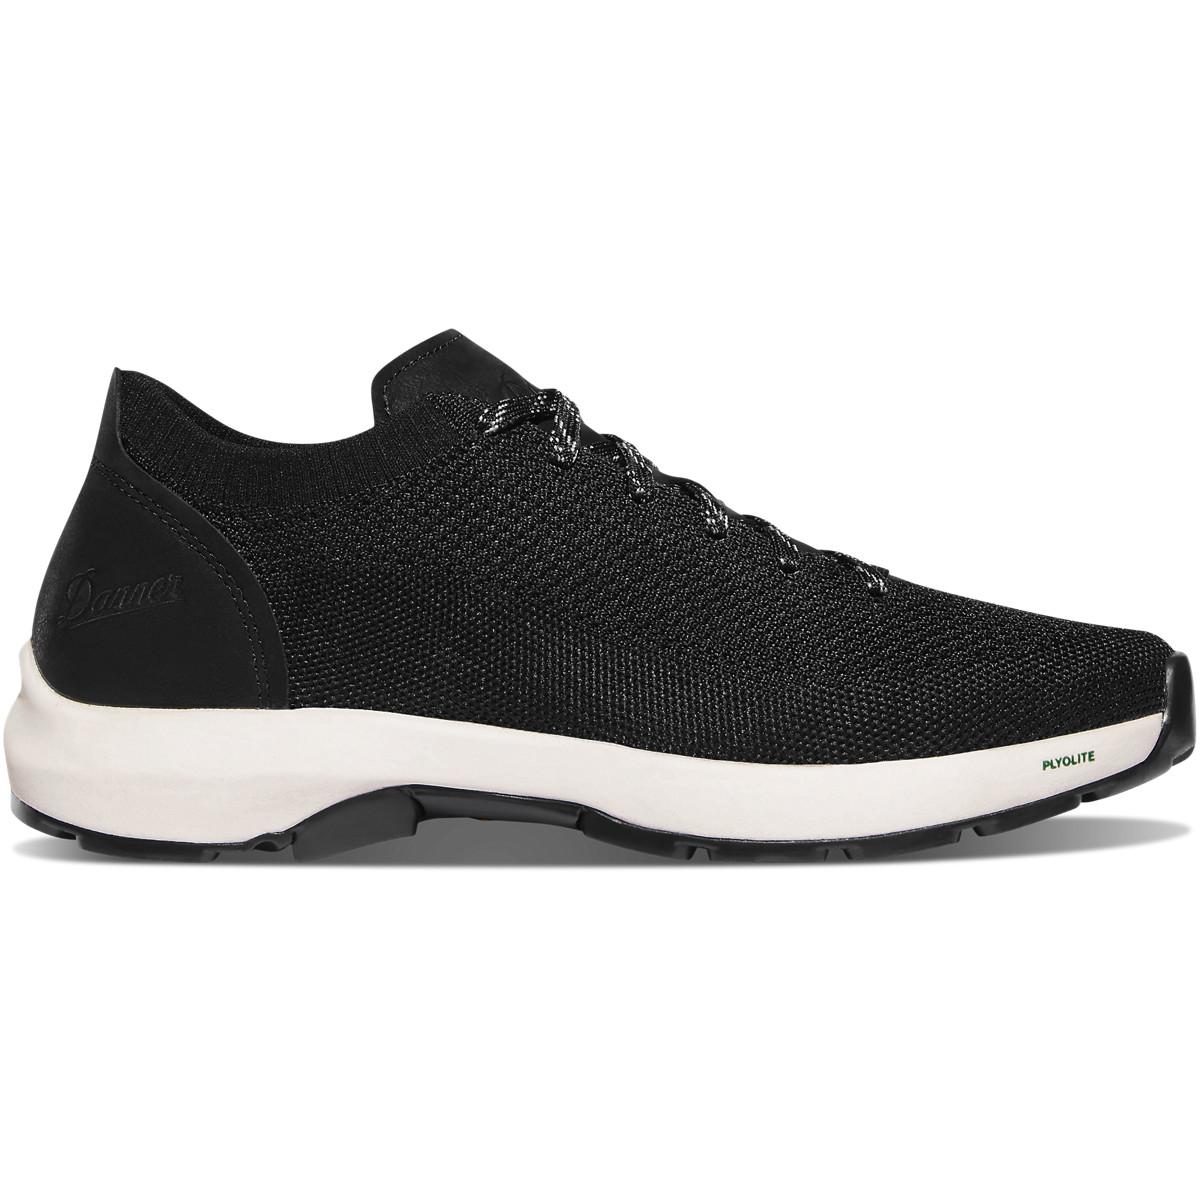 Danner Mens Caprine 4 Lifestyle Shoe